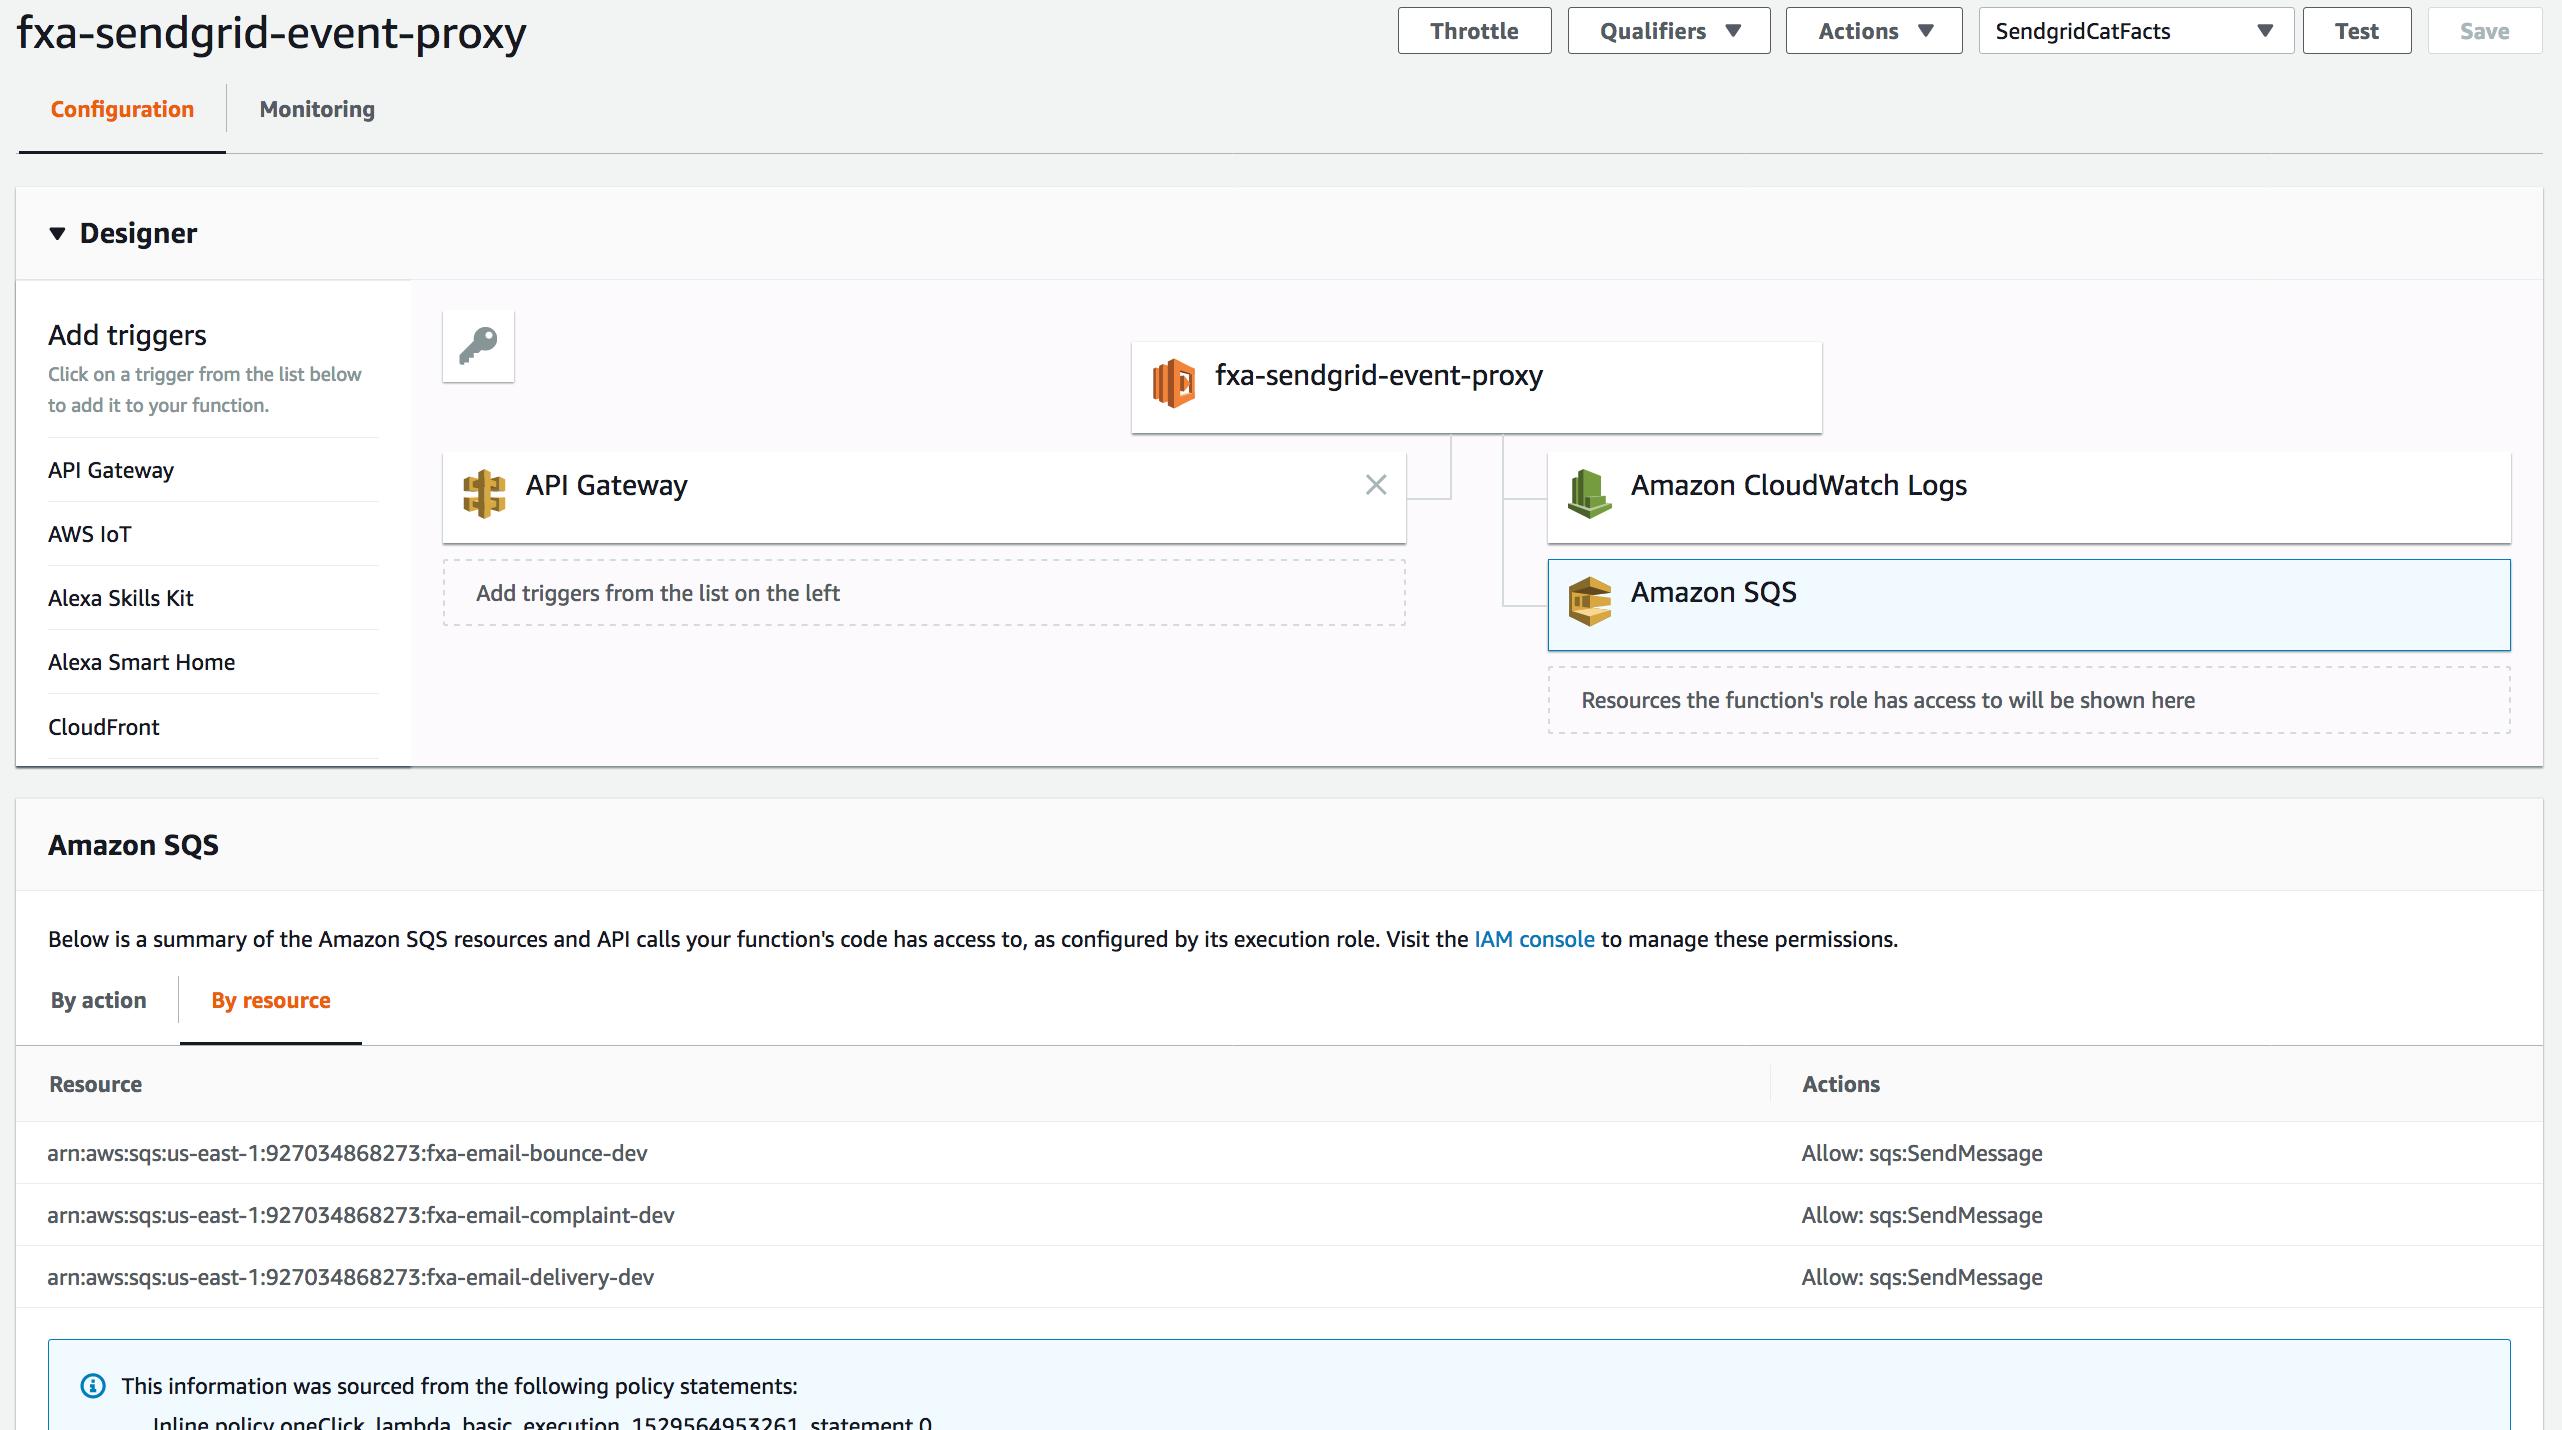 Screenshot showing AWS Lambda config to set up fxa-email-event-proxy for Sendgrid